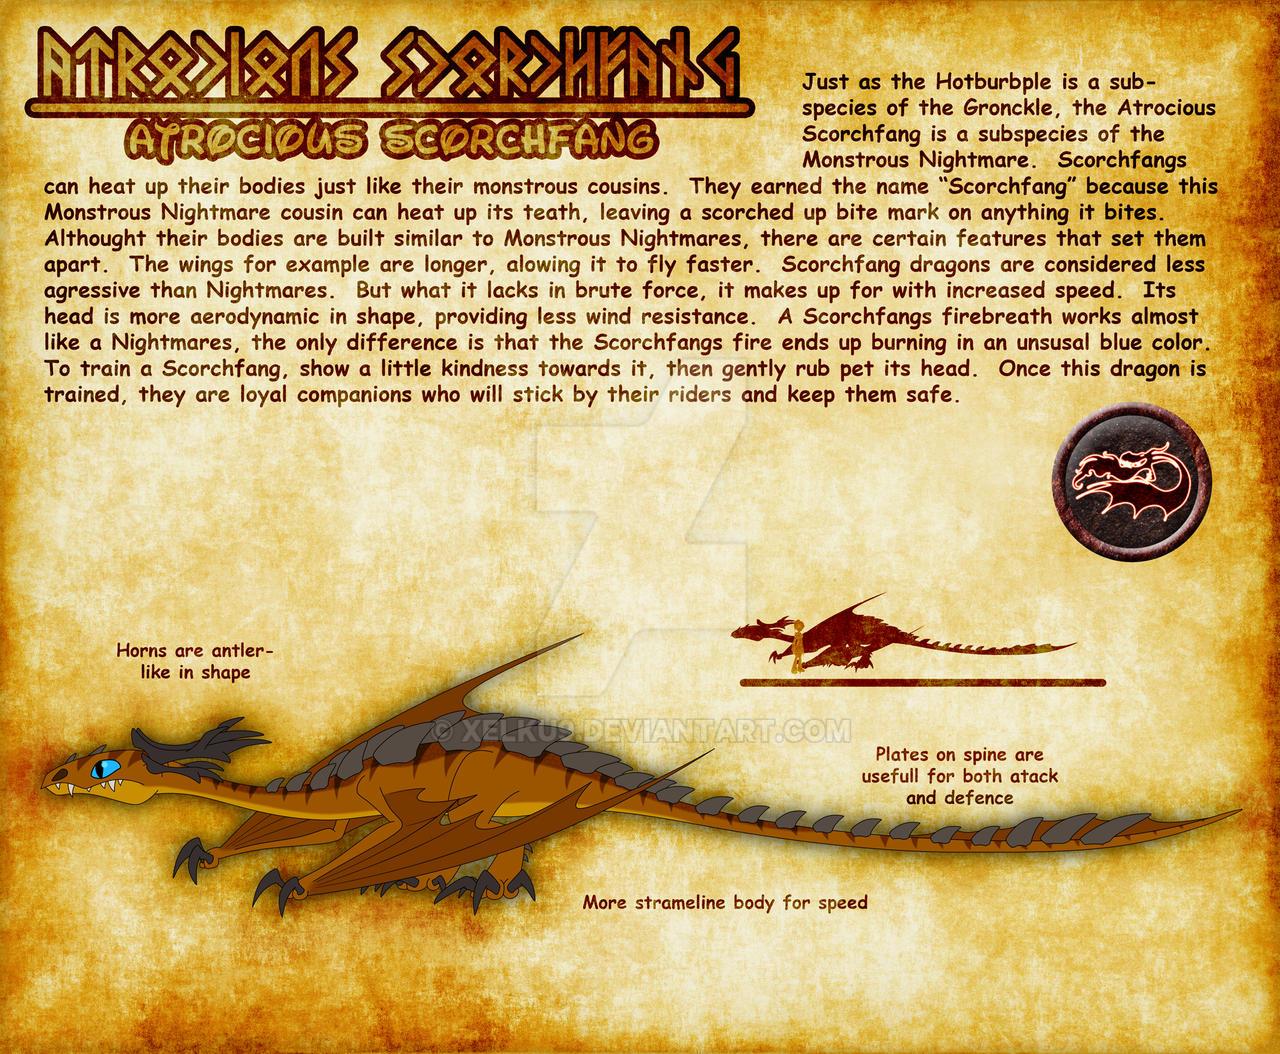 How to train your dragon by xelku9 on deviantart xelku9 31 33 atrocious scorchfang dragon by xelku9 ccuart Image collections